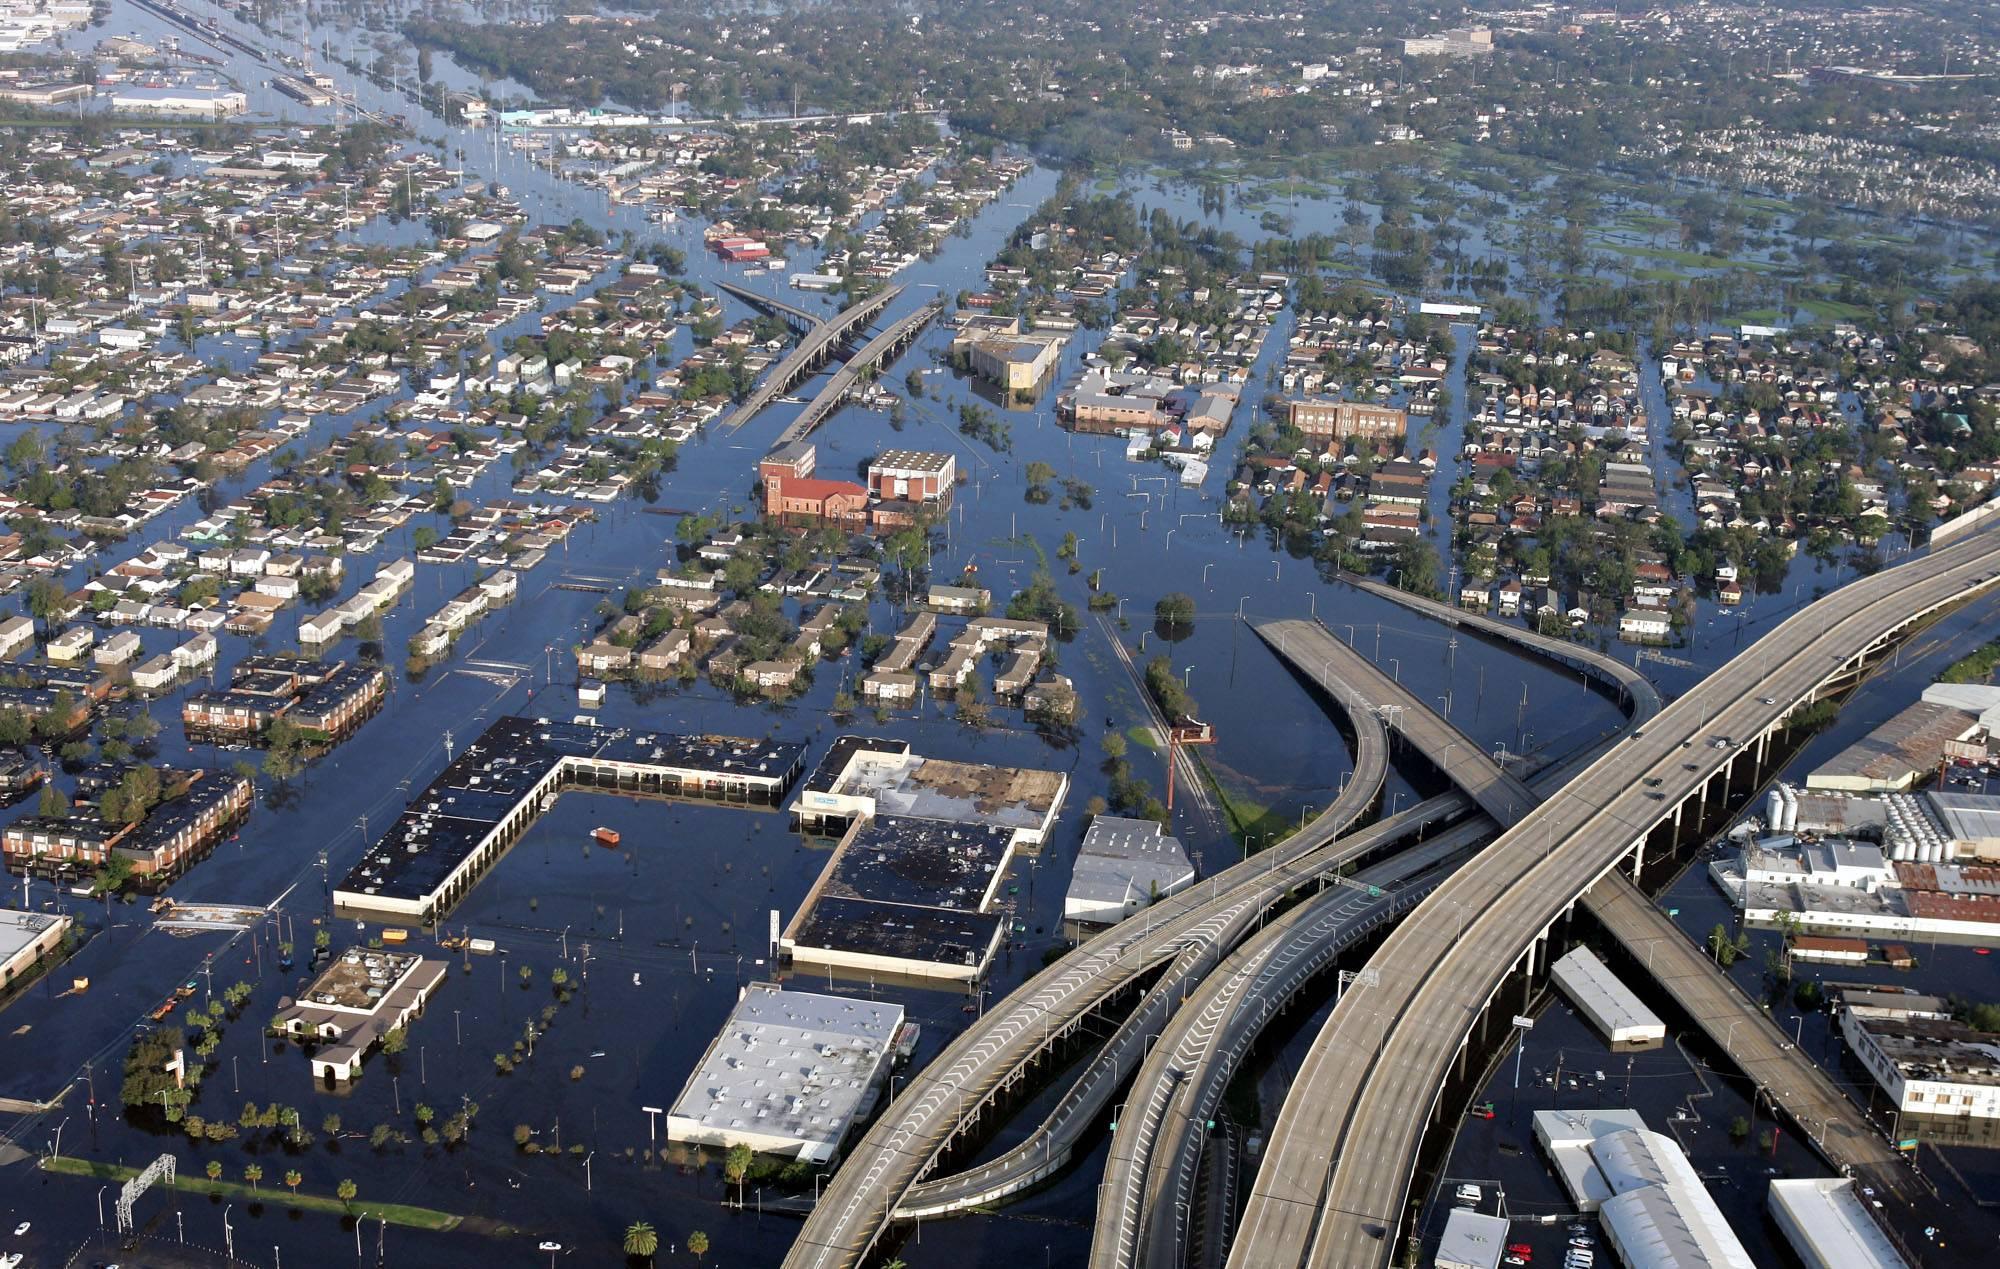 hurricane katrina development and devastation //wwwchroncom/news/houston-texas/article/katrina-devastation-not-unrivaled-analysis development, hurricane katrina devastation wrought by katrina.